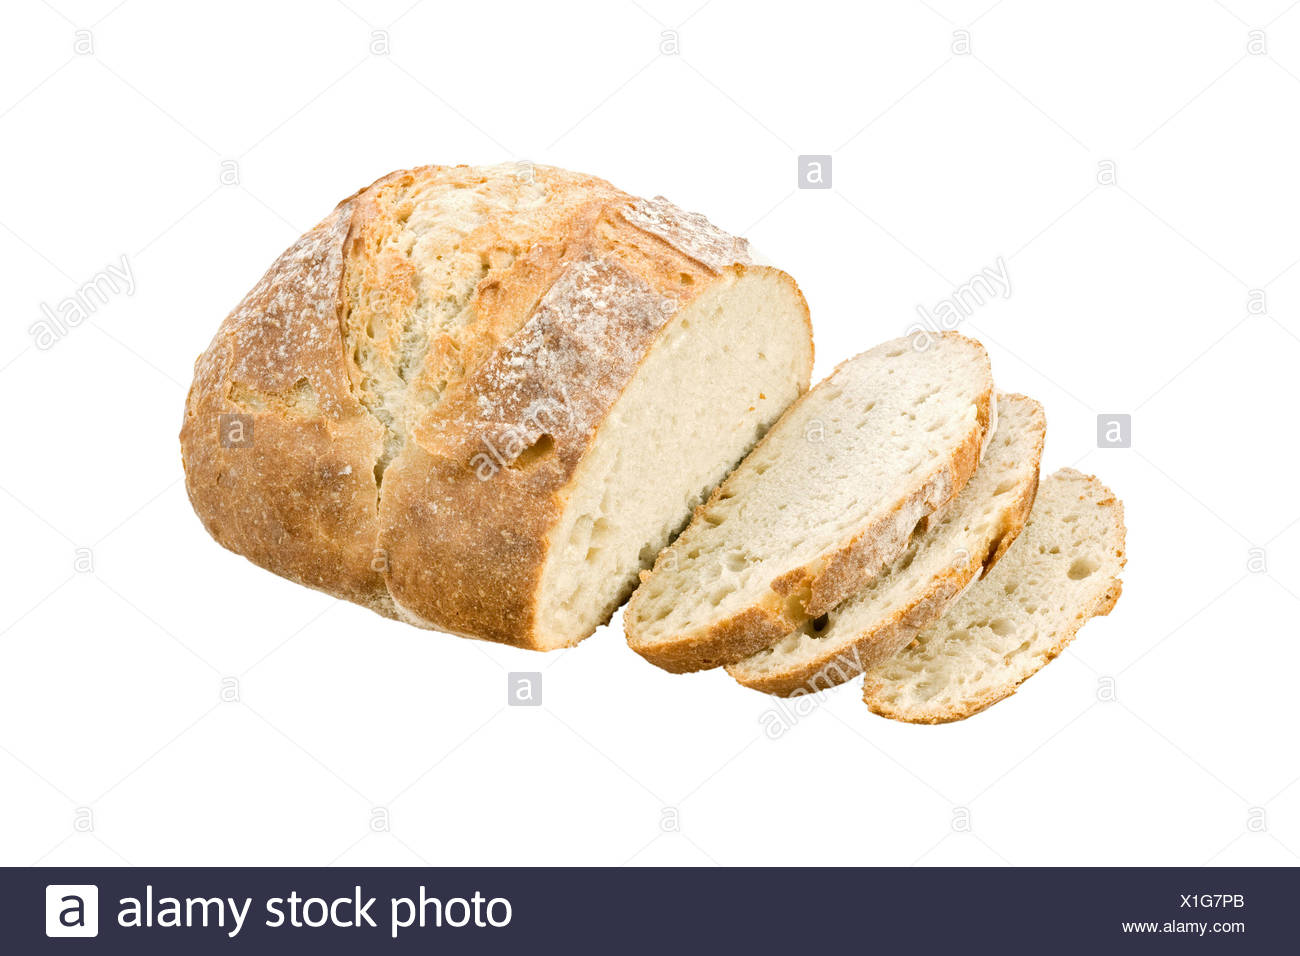 White artisan bread. - Stock Image